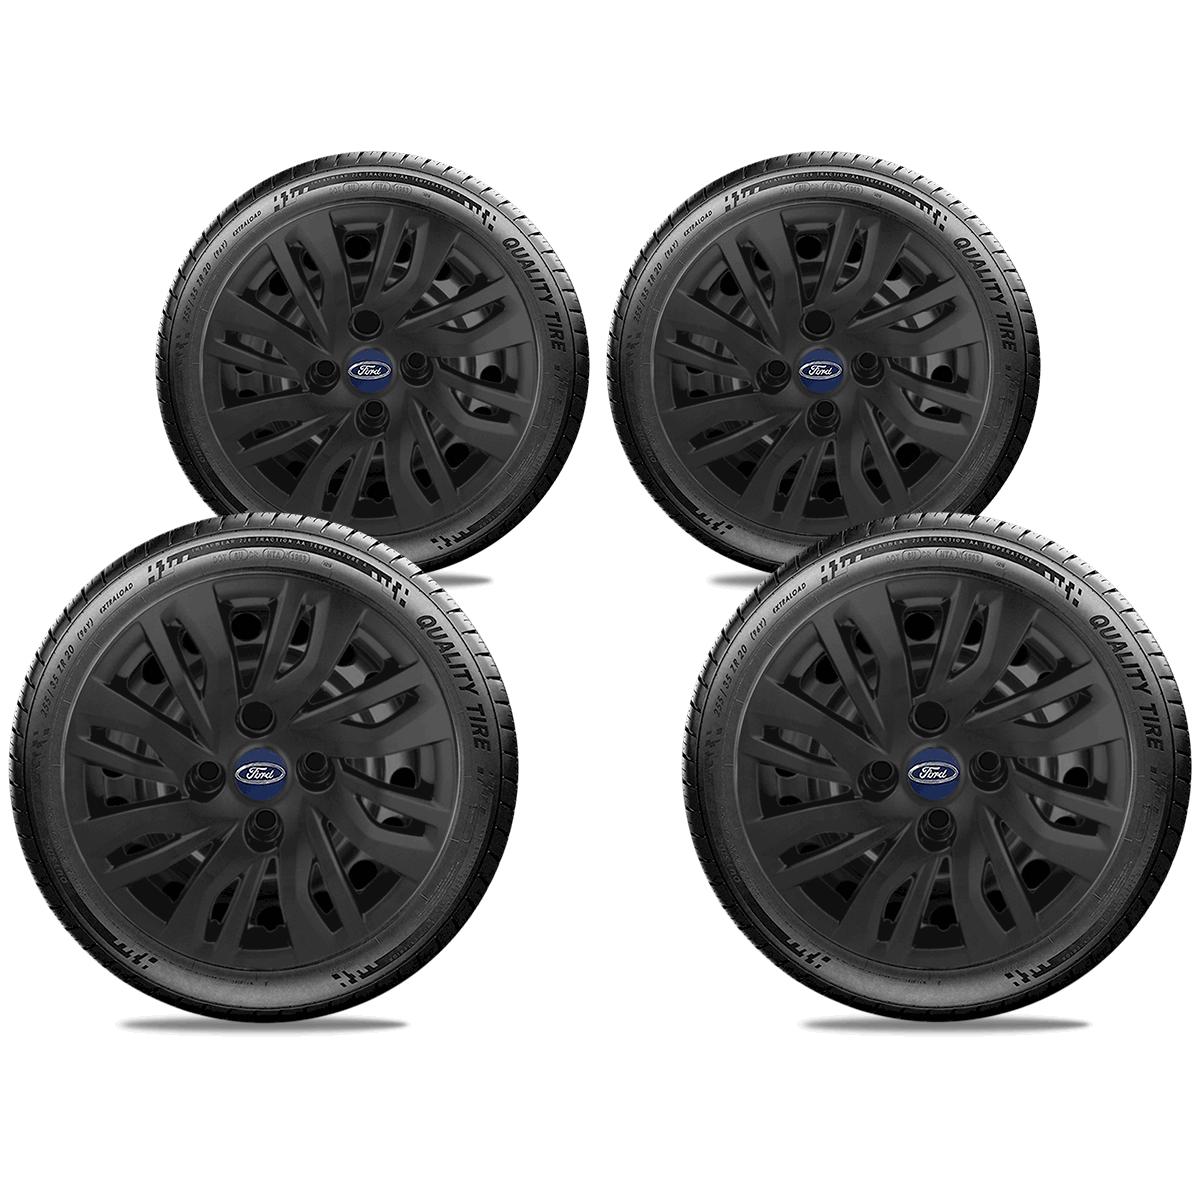 Calota Preto Fosco Jogo 4Pçs Ford Novo Ka 2017 2018 2019 2020 Aro 14 G344Pfj